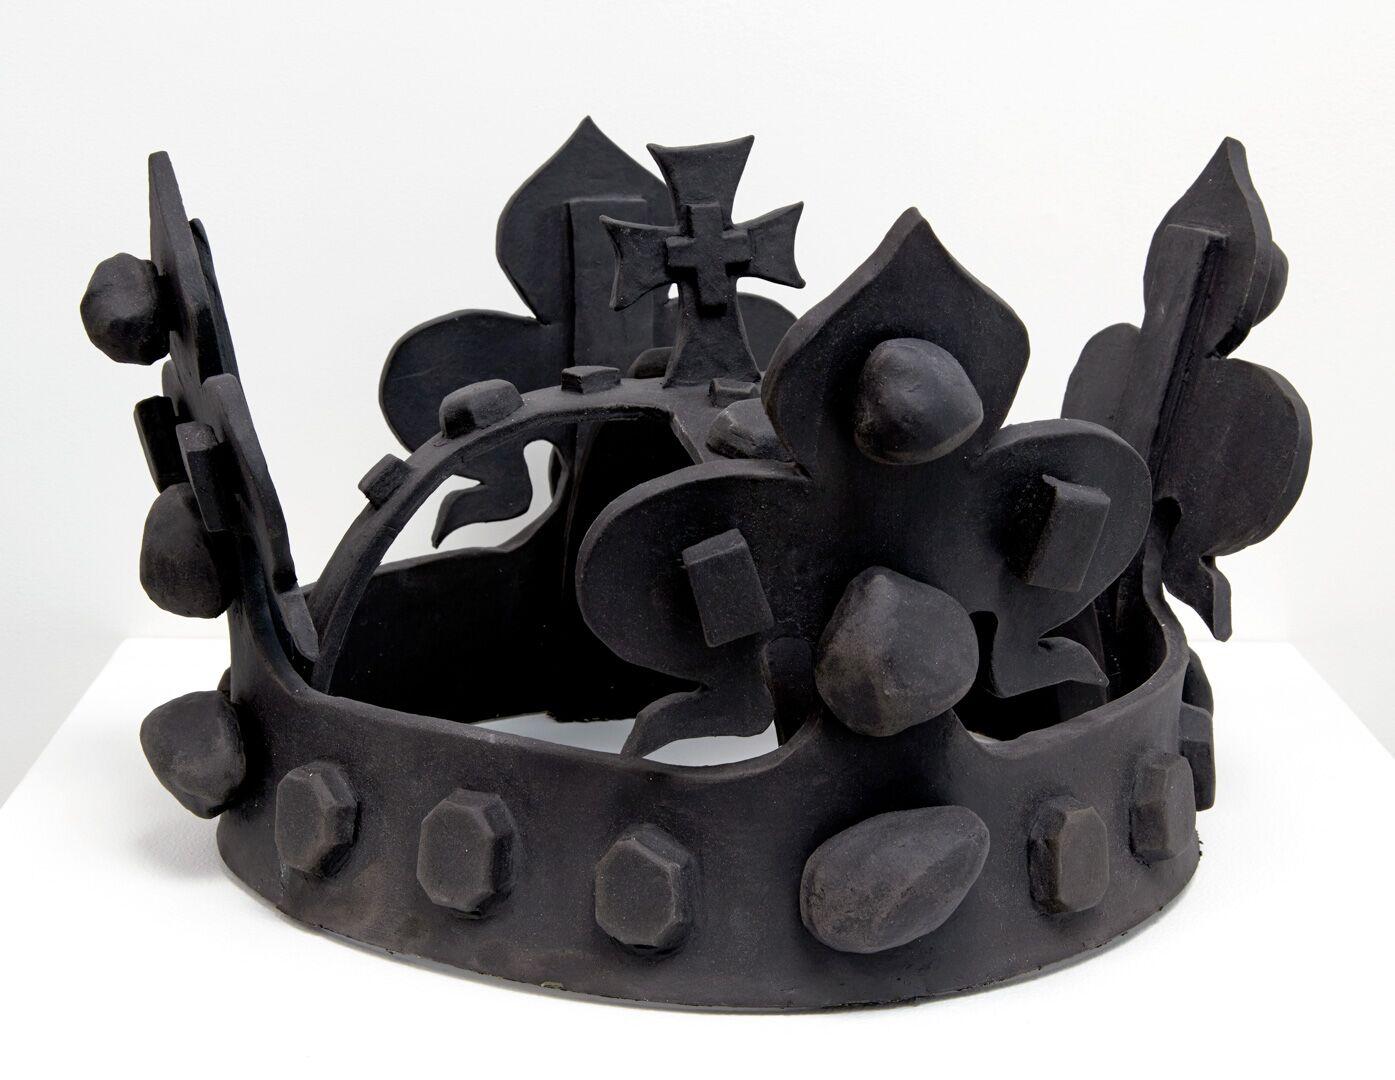 Crown of Wenceslas, Bohemia, Czech Republic, ca. 1377